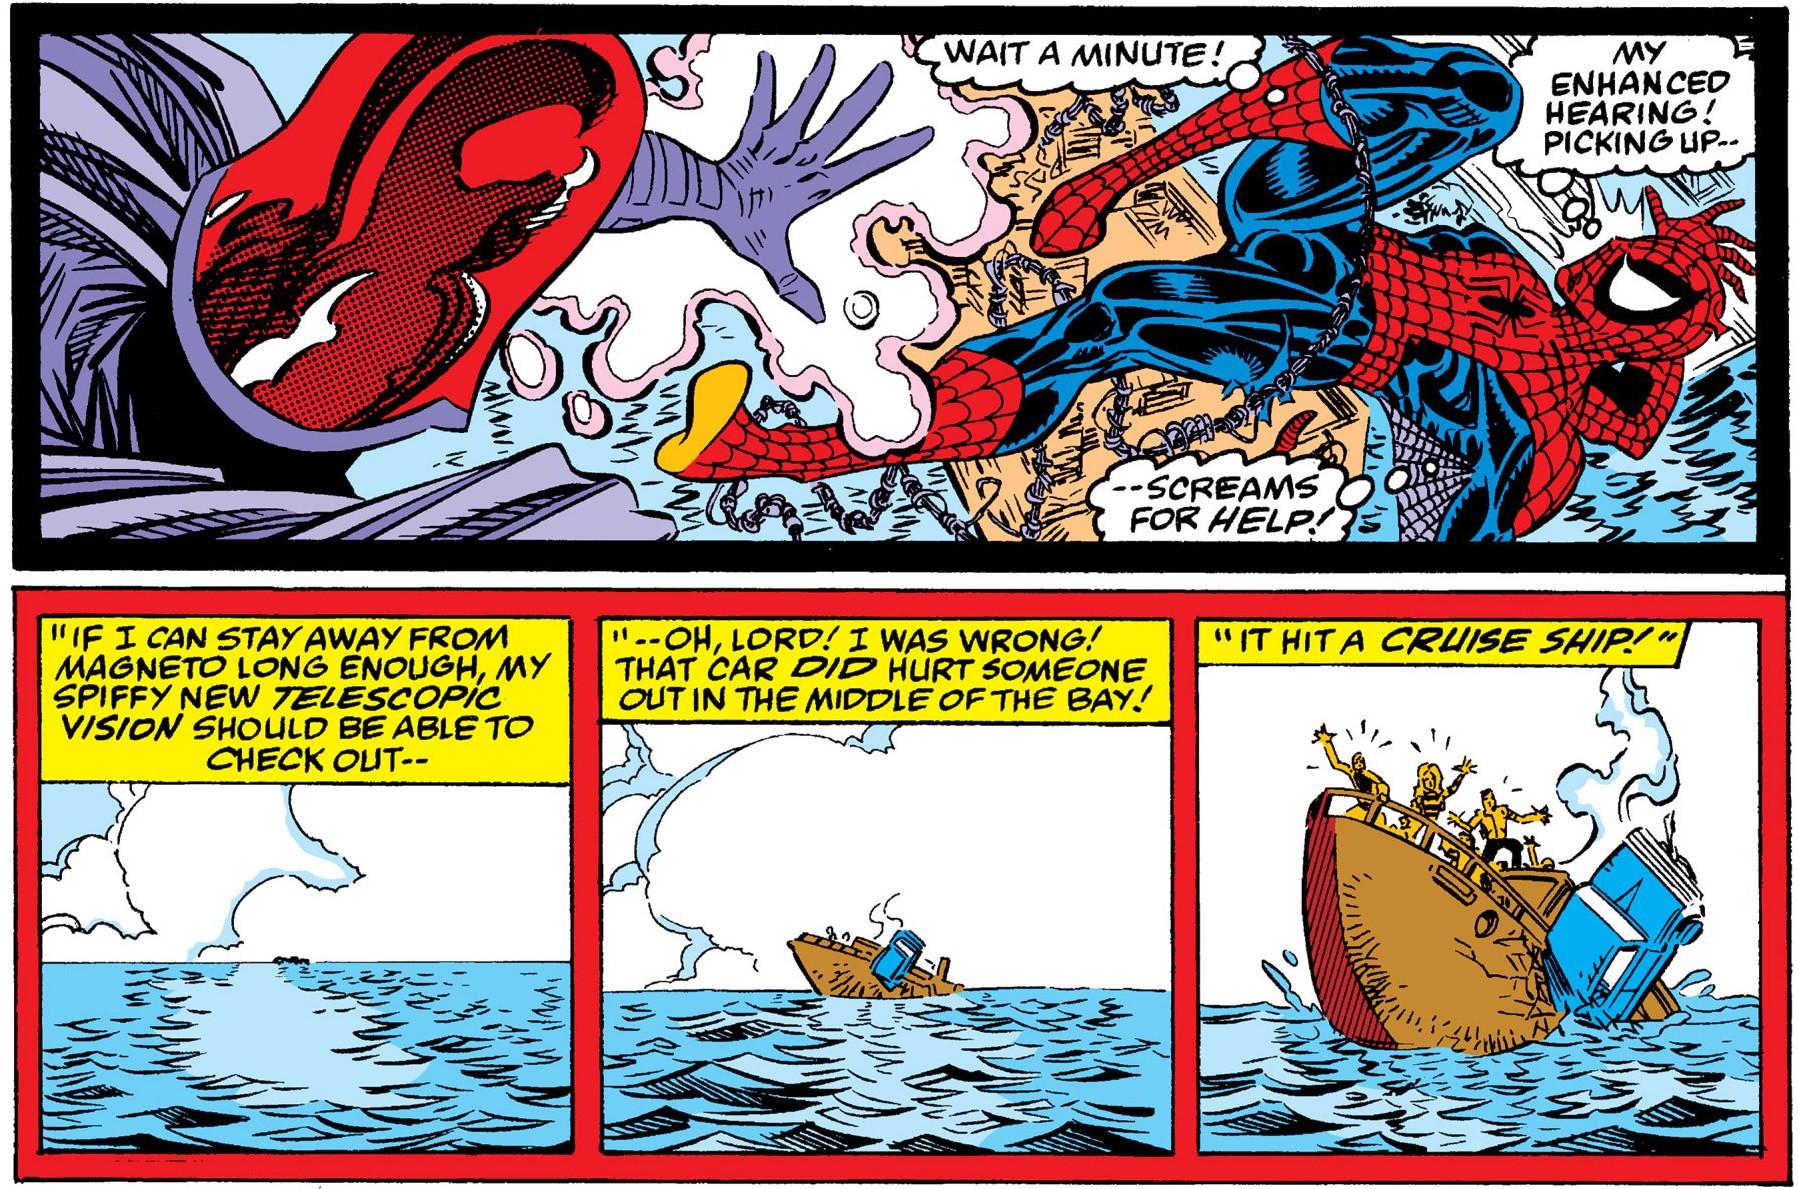 spiderman senses sinking ship